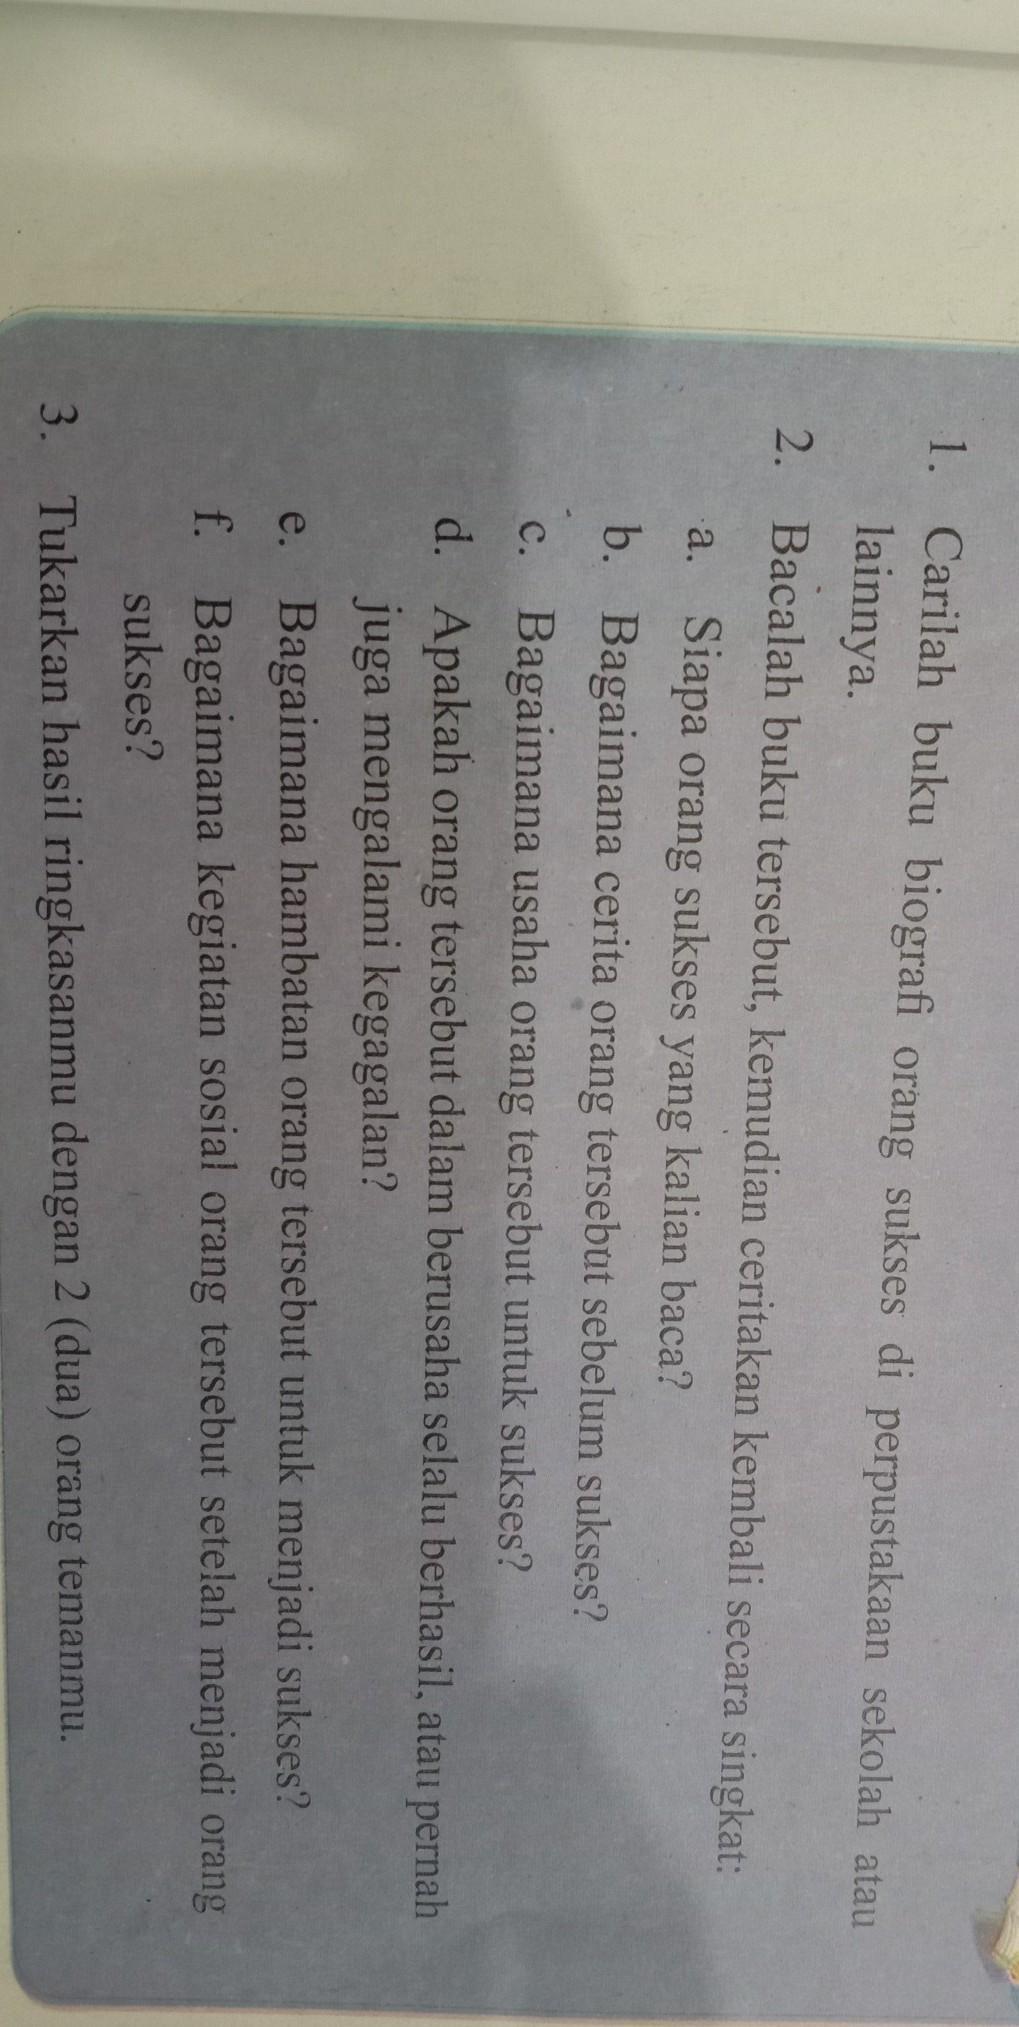 Jawaban Ips Kelas 8 Halaman 107 Guru Ilmu Sosial